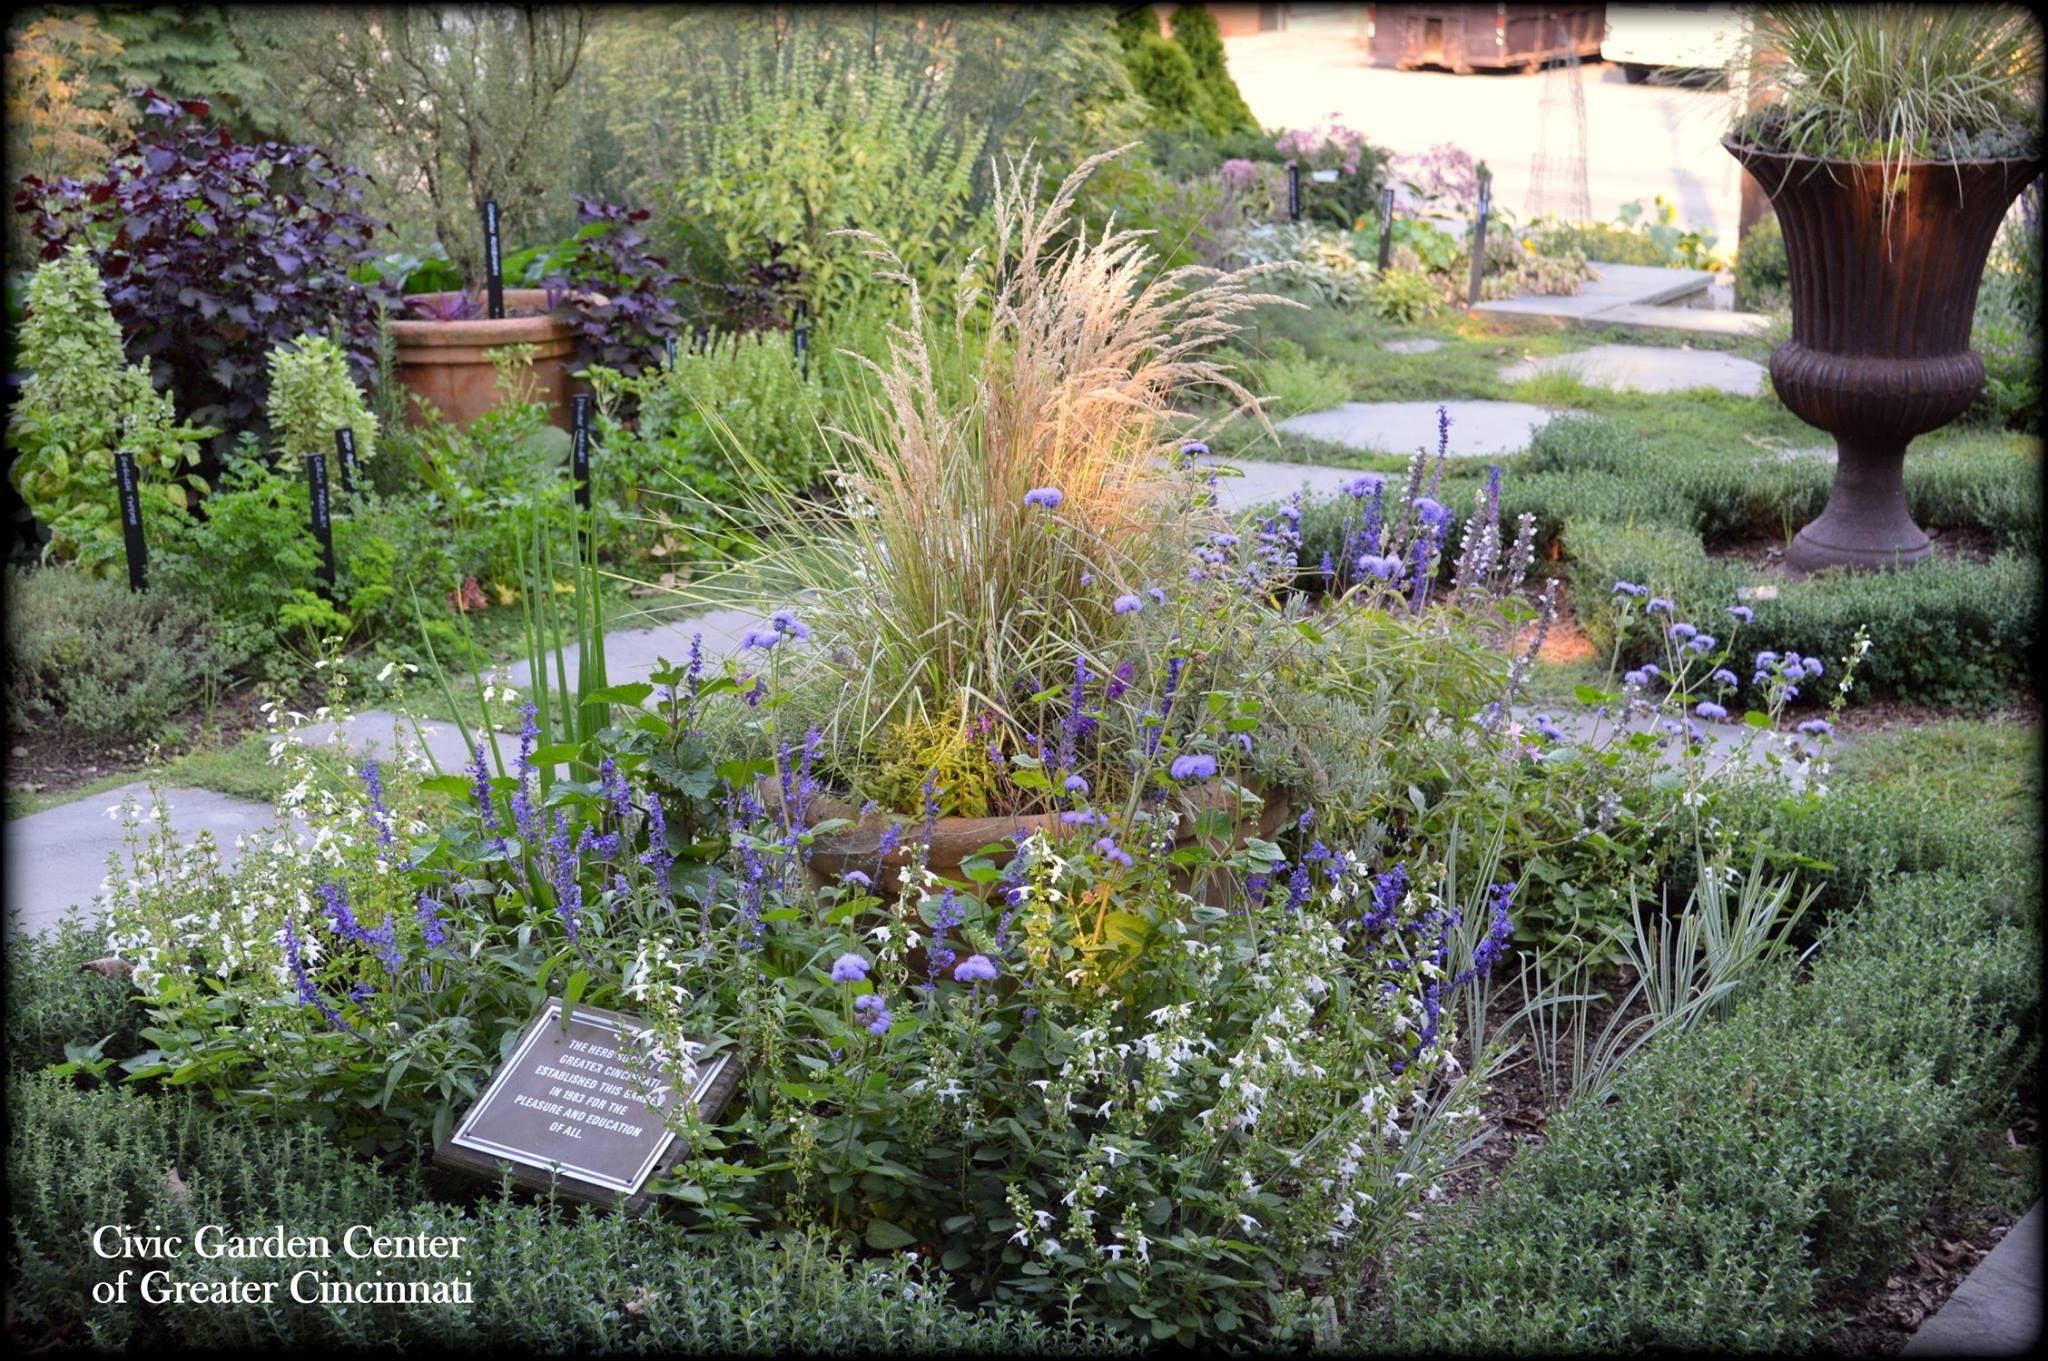 Cincinnati, Gardening, Garden, Yard Landscaping, Urban Homesteading,  Horticulture